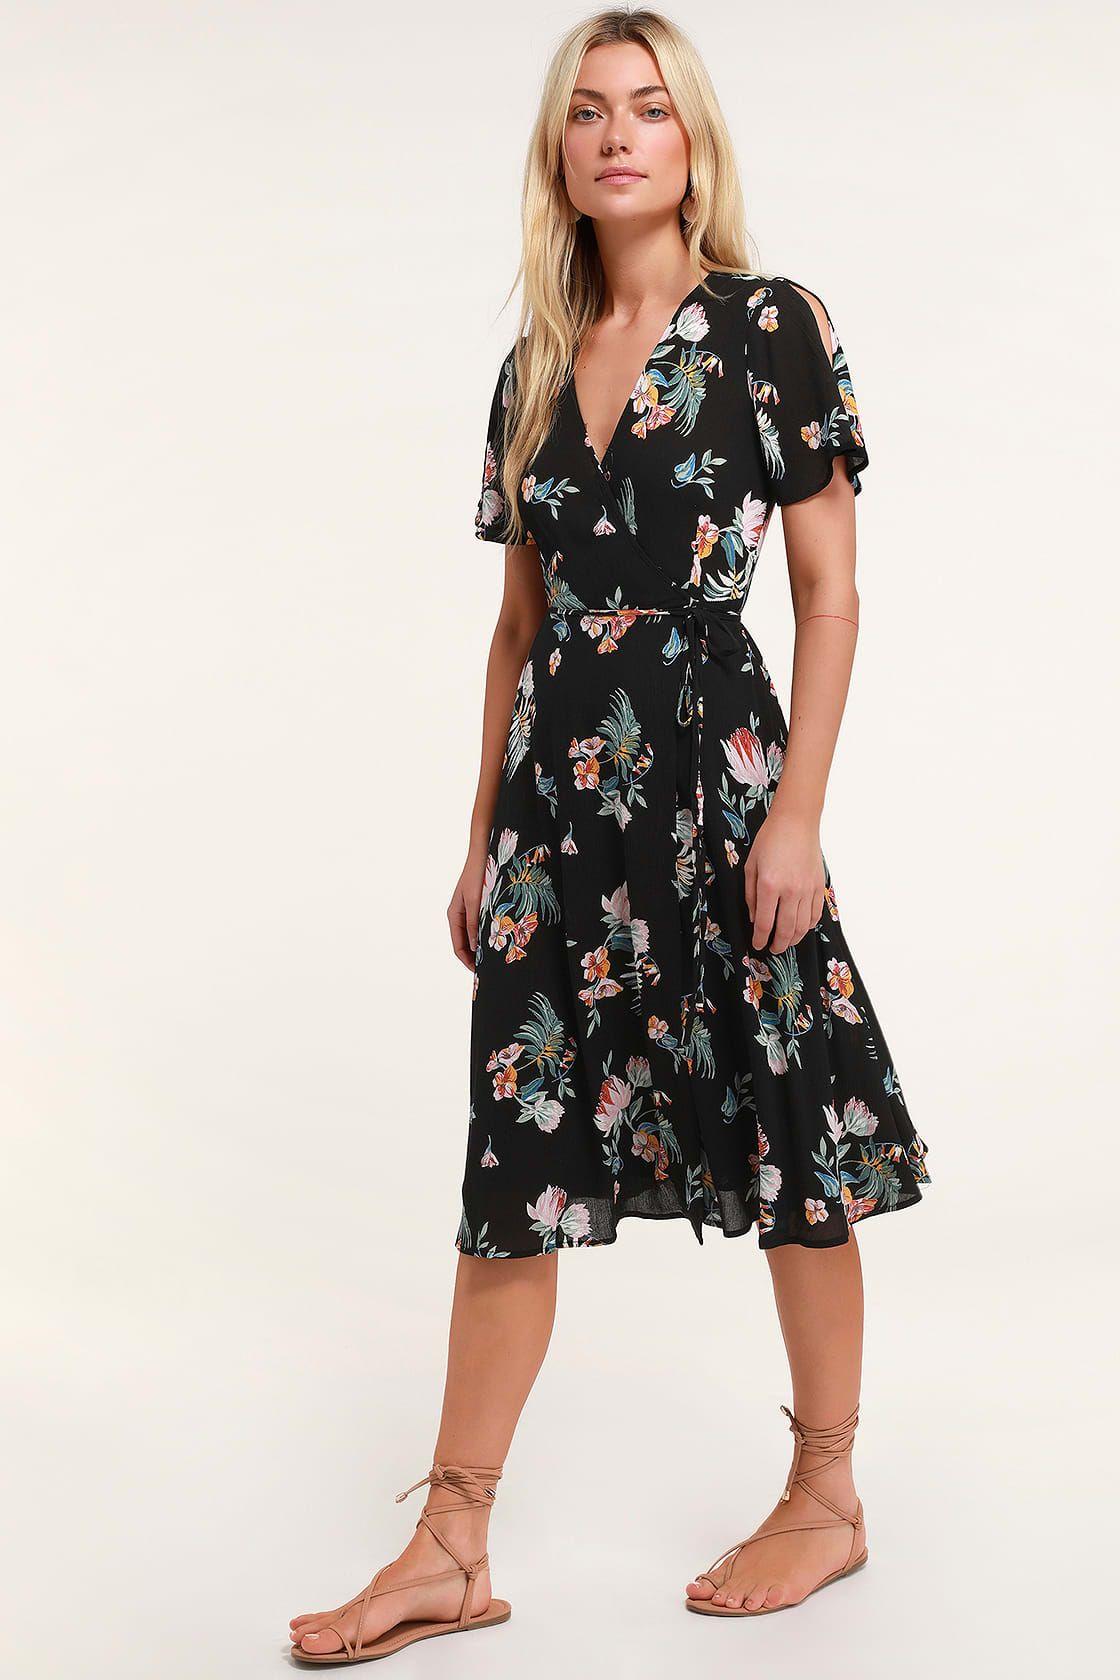 Jet Set For Sun Black Tropical Print Wrap Midi Dress Floral Print Midi Dress Dresses Cute Floral Dresses [ 1680 x 1120 Pixel ]